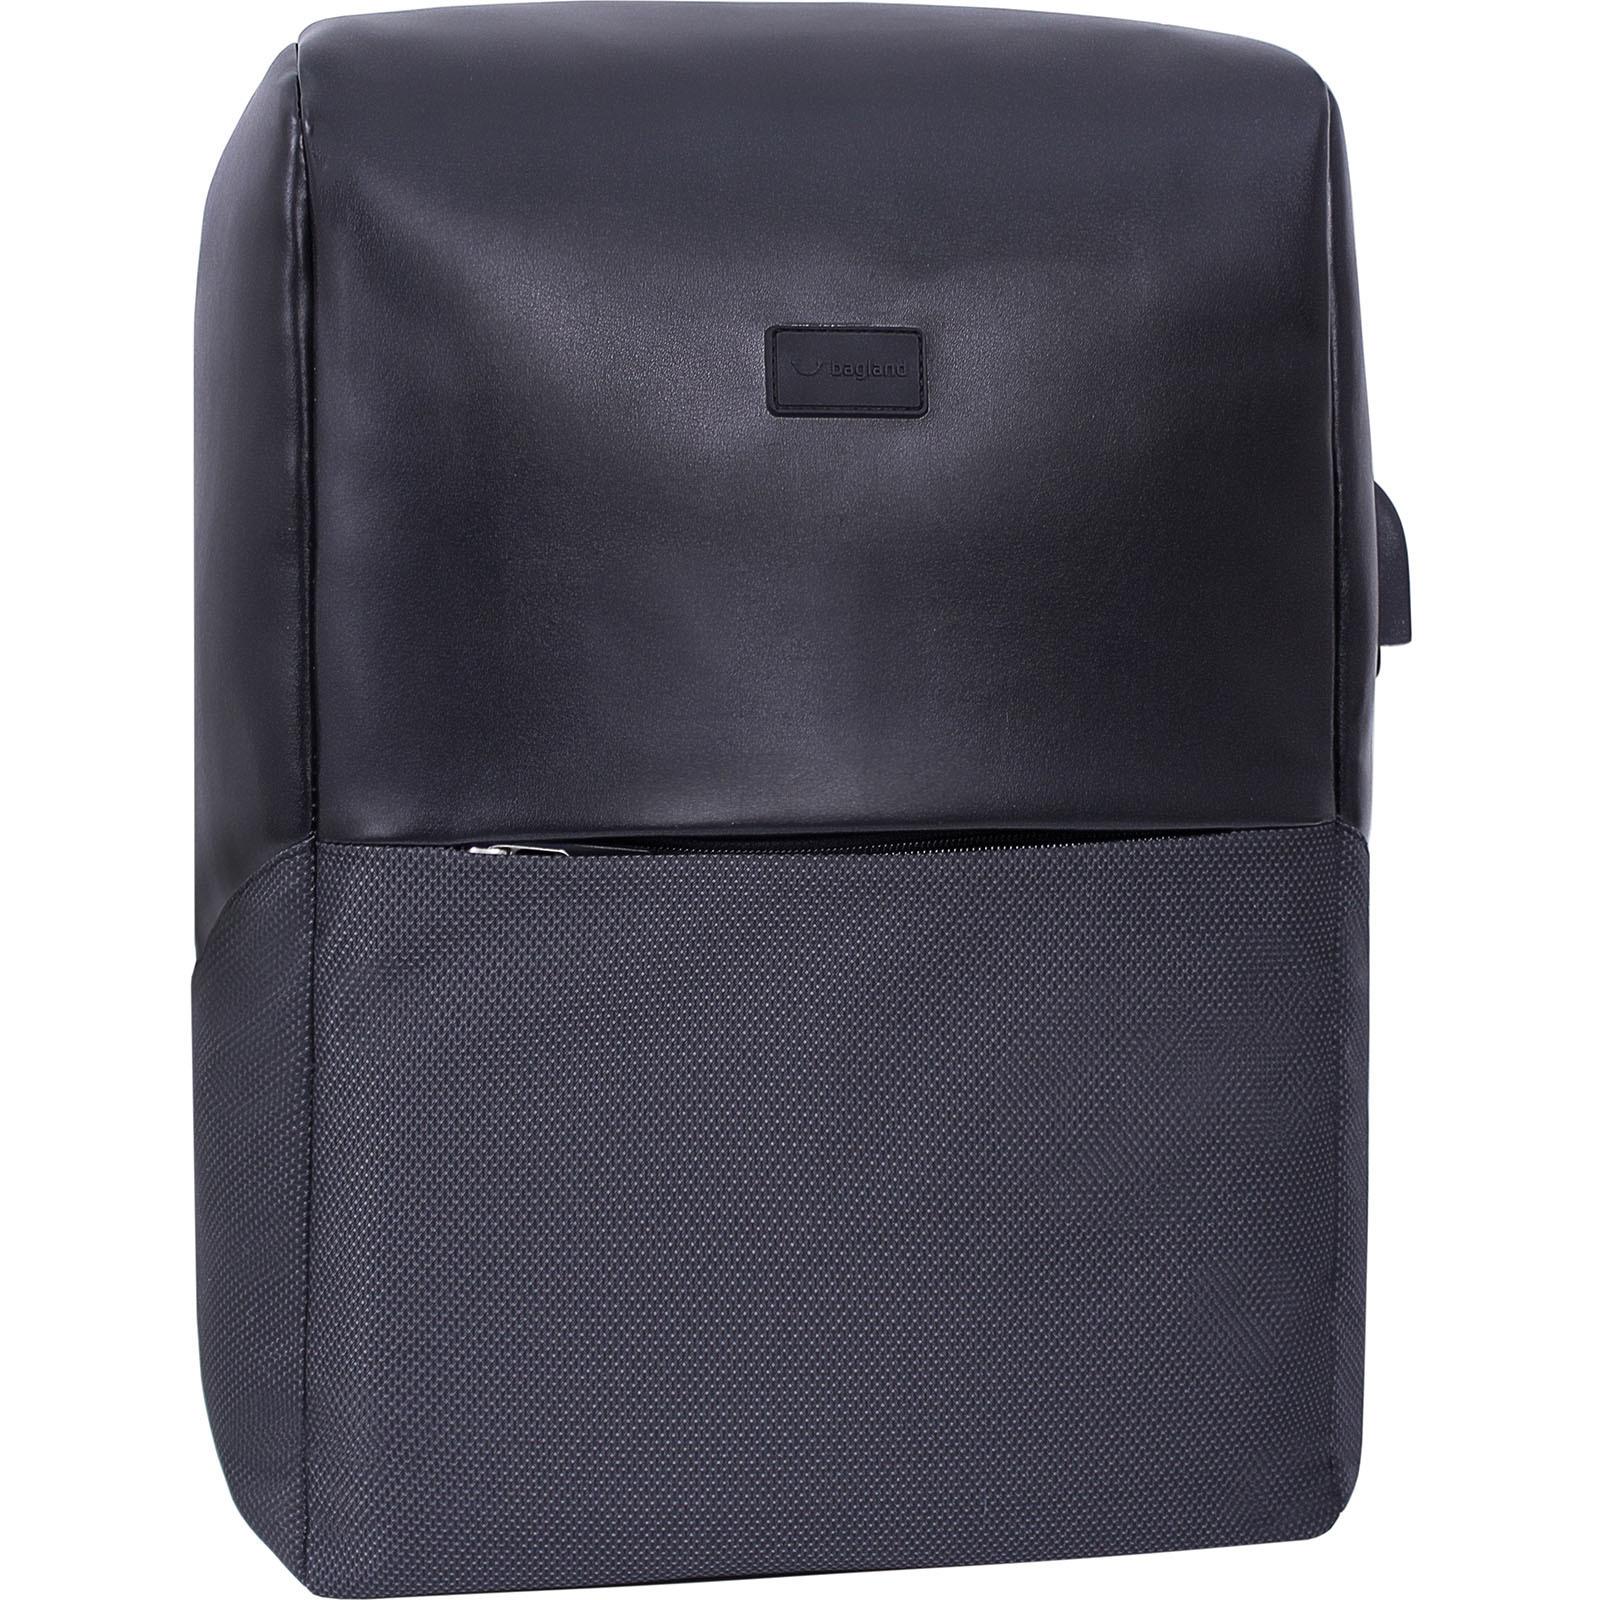 Городские рюкзаки Рюкзак Bagland Brooklyn 18 л. черный (00194169) IMG_9527.JPG